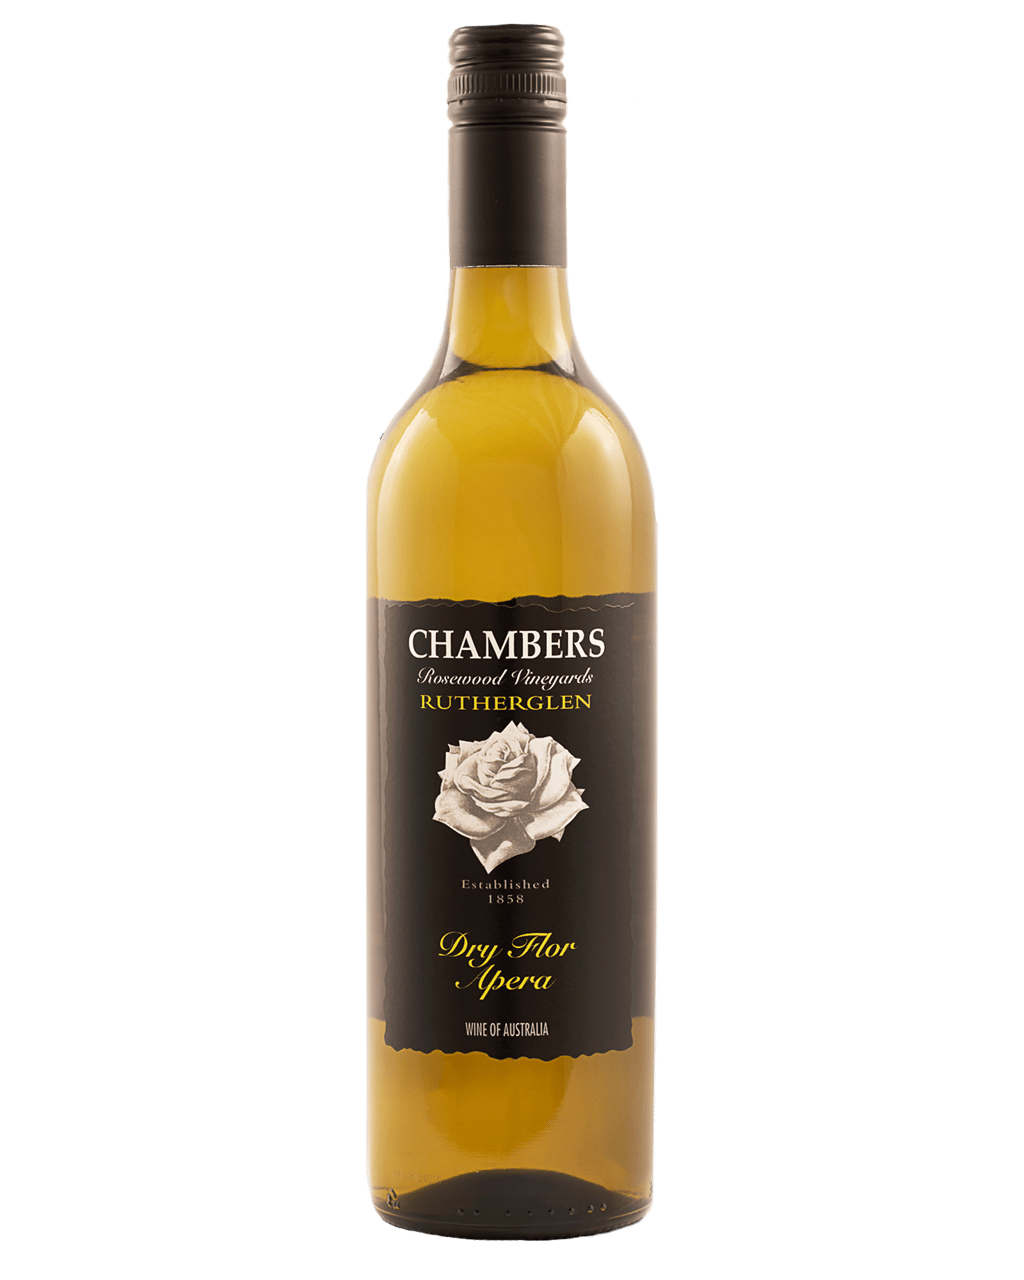 Chambers Rutherglen Dry Flor Apera Dan Murphys Buy Wine Palomino Niel Hand Bag Abu Champagne Beer Spirits Online